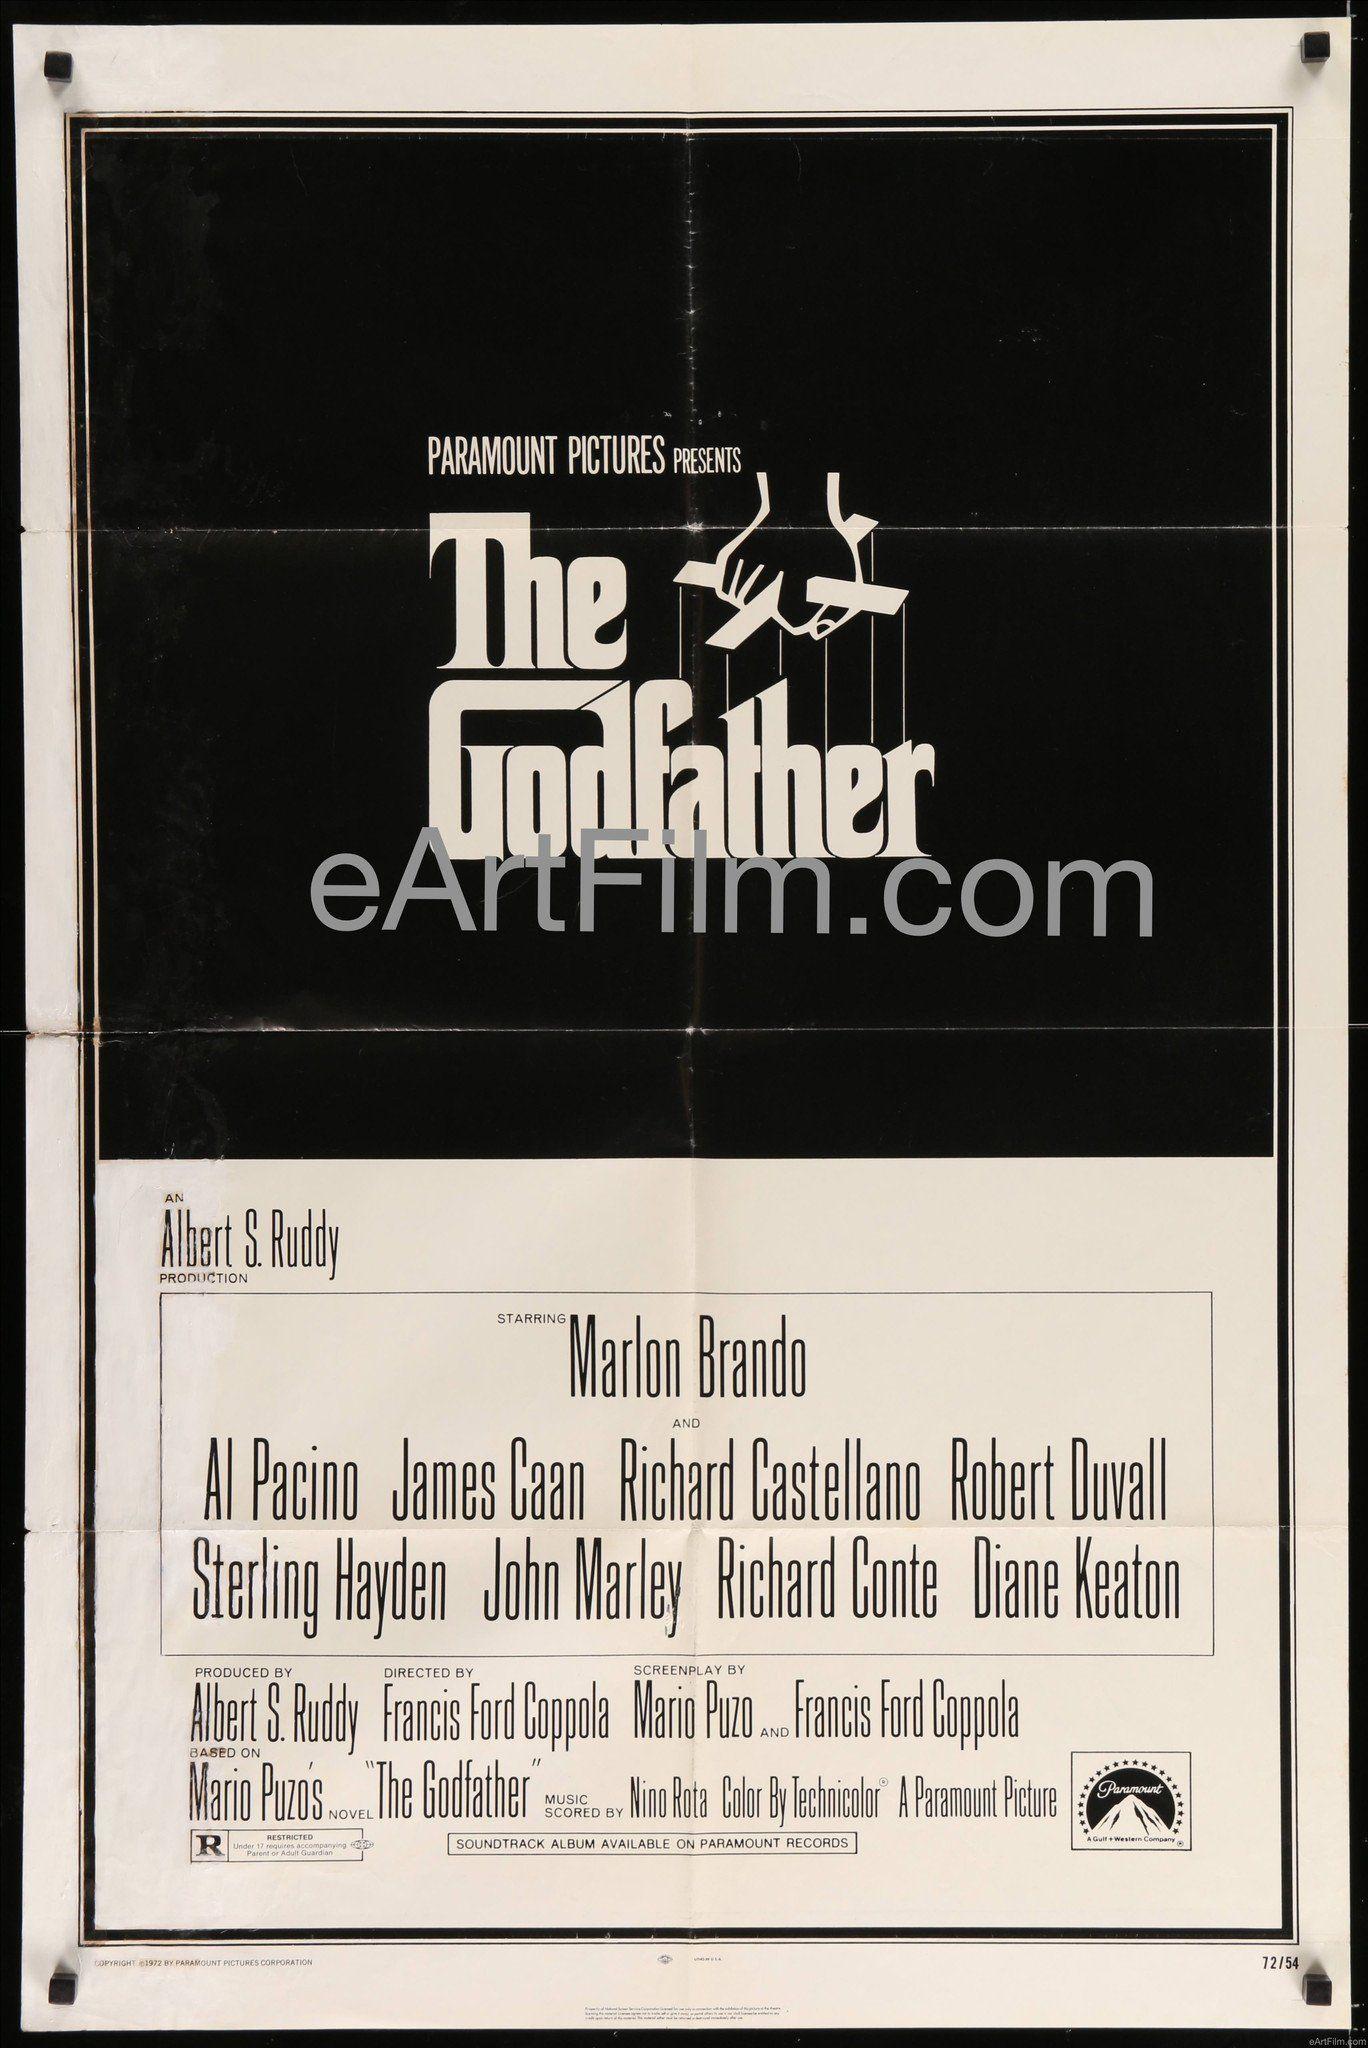 Godfather 1972 27x41 Francis Ford Coppola Marlon Brando Al Pacino James Caan Robert Duvall The Godfather Francis Ford Coppola Al Pacino